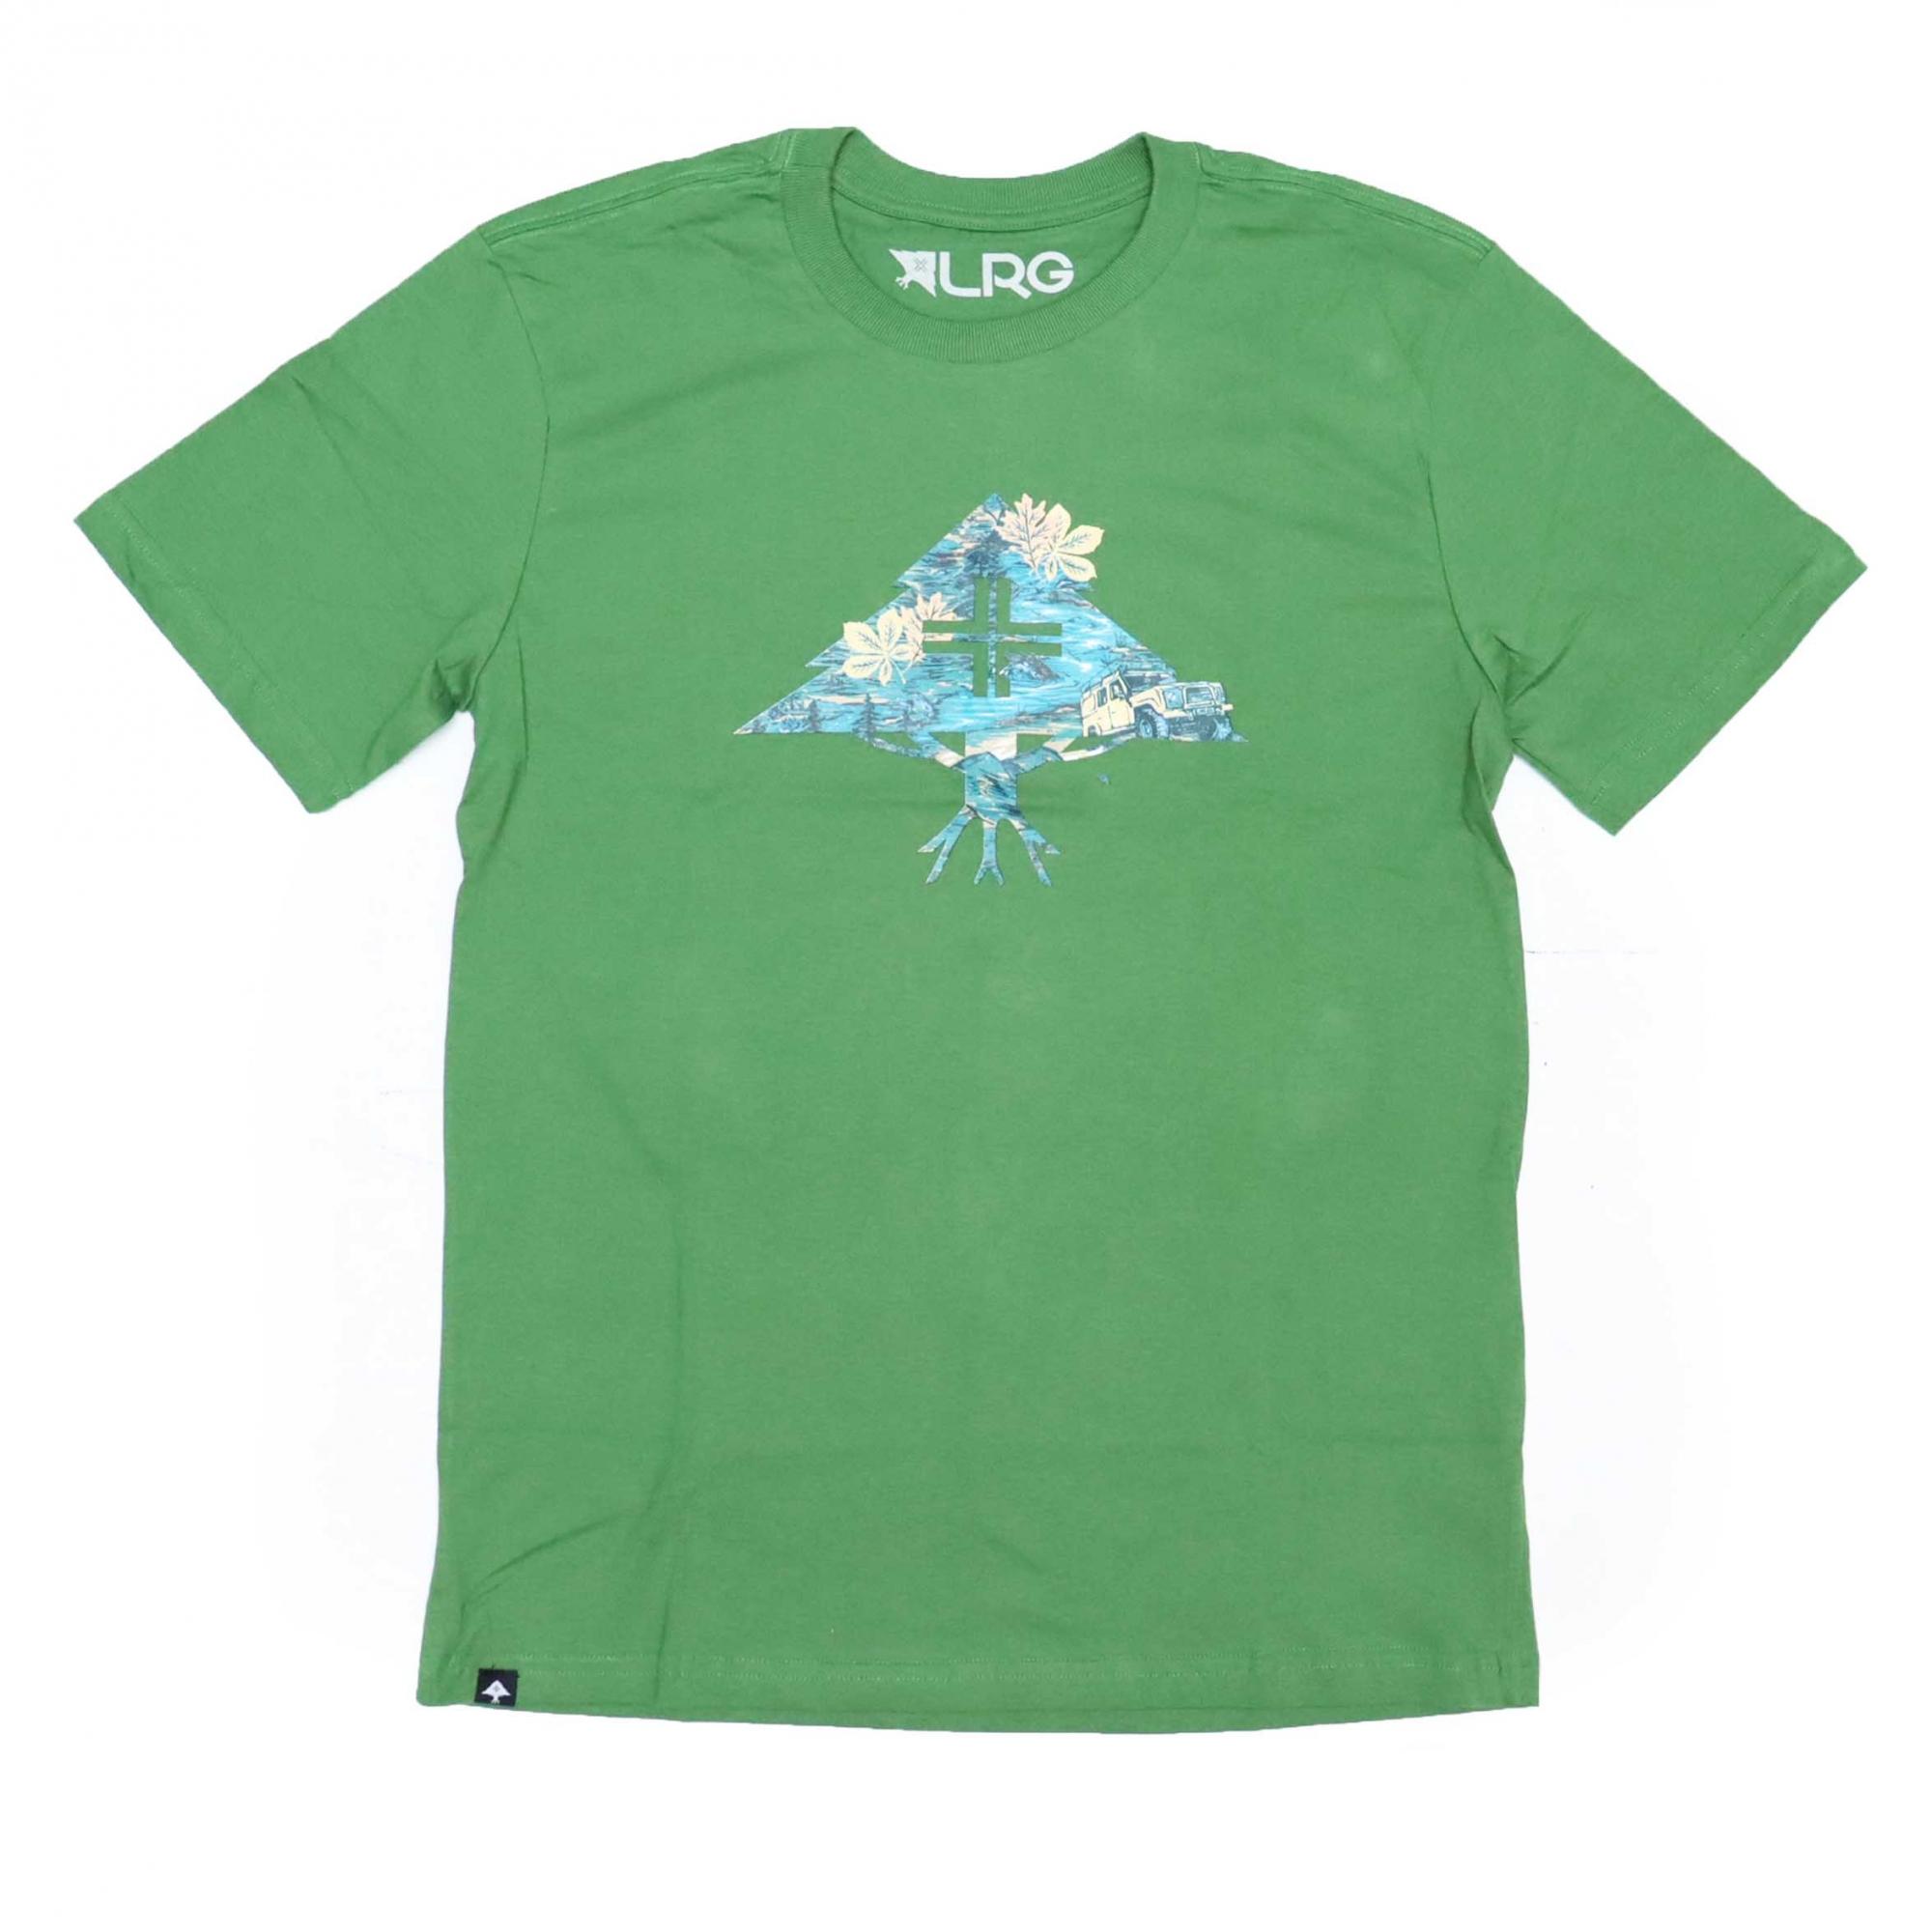 Camiseta LRG Research - Verde Militar